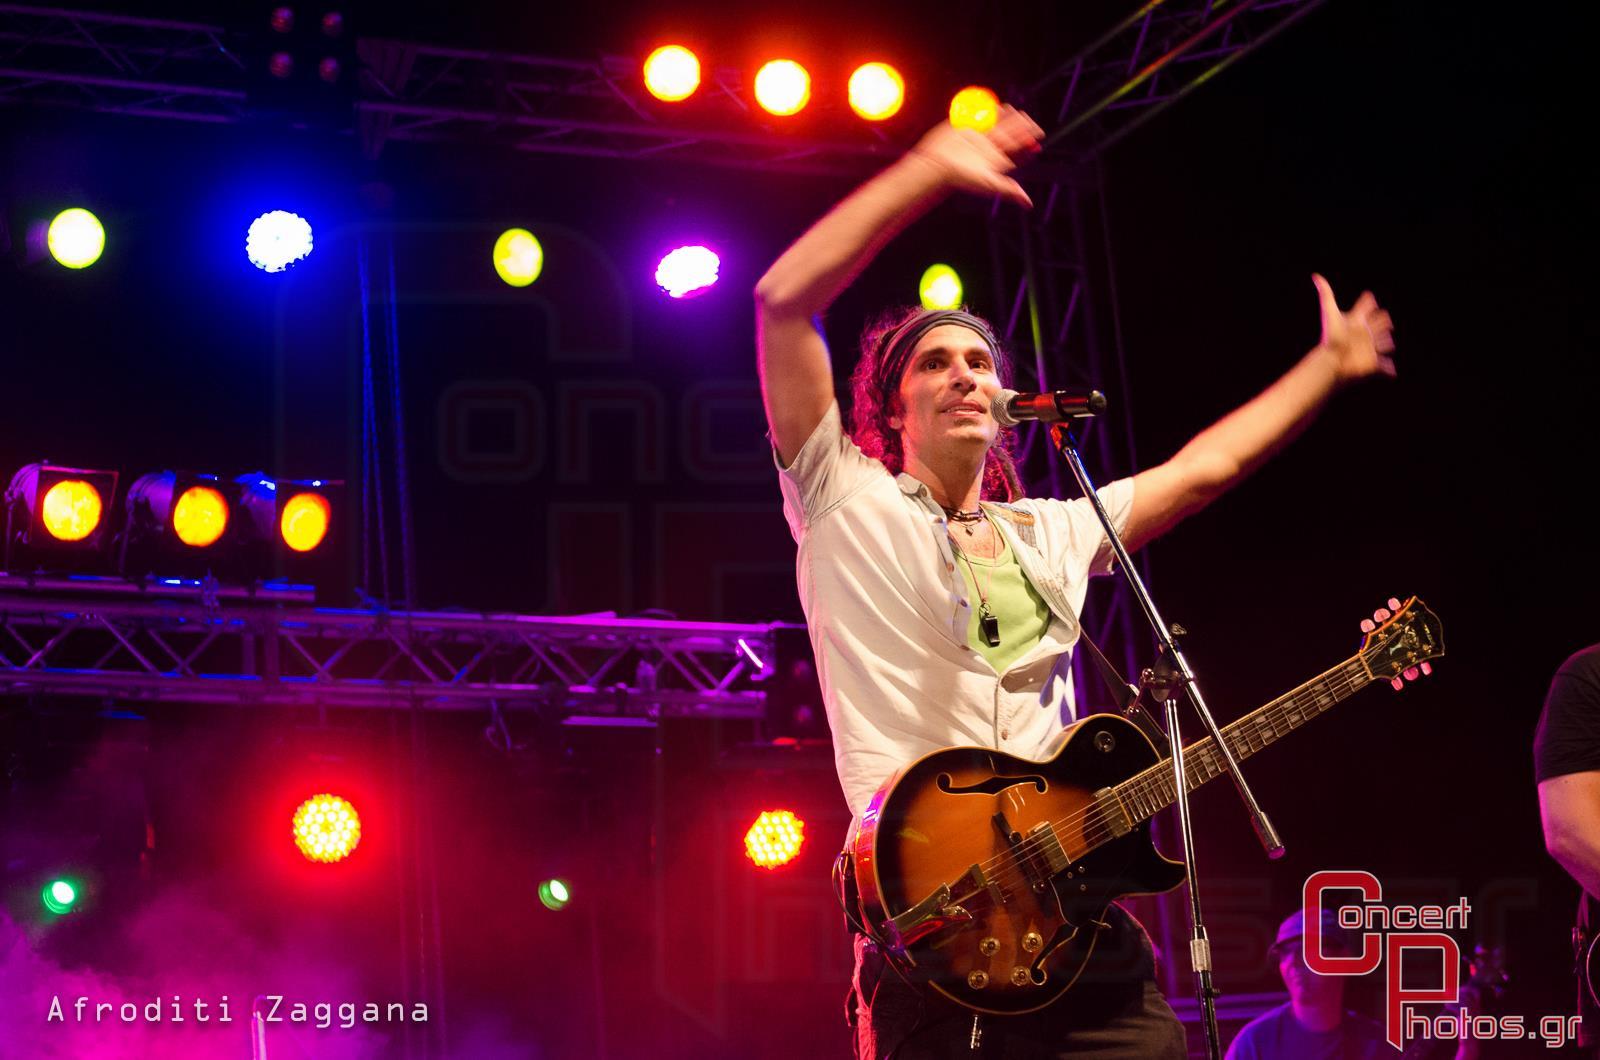 Locomondo- photographer:  - concertphotos_-9391